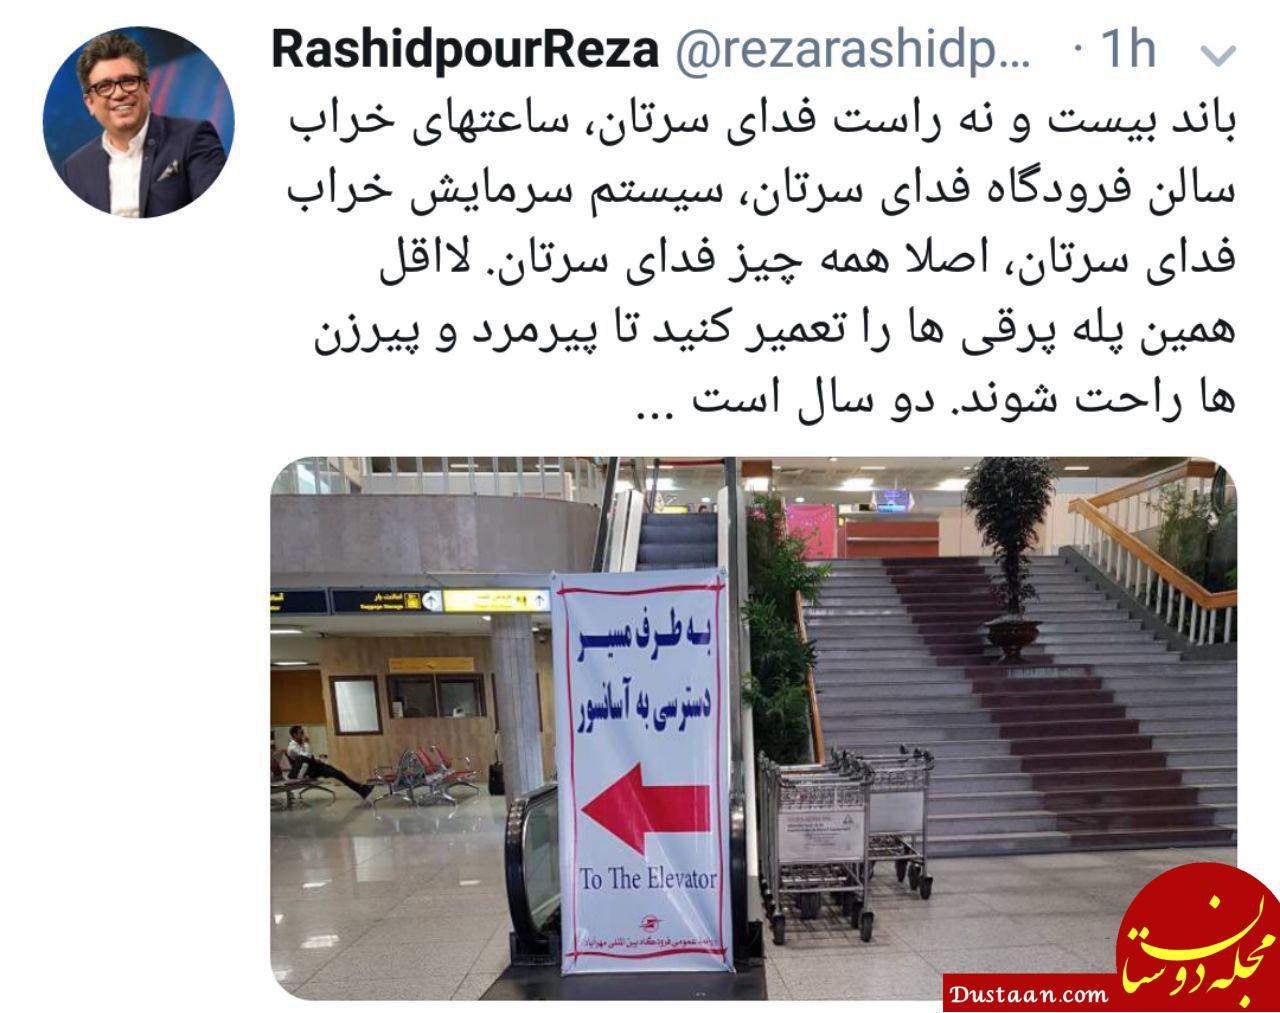 www.dustaan.com انتقاد رشیدپور از وضعیت فرودگاه مهرآباد +عکس